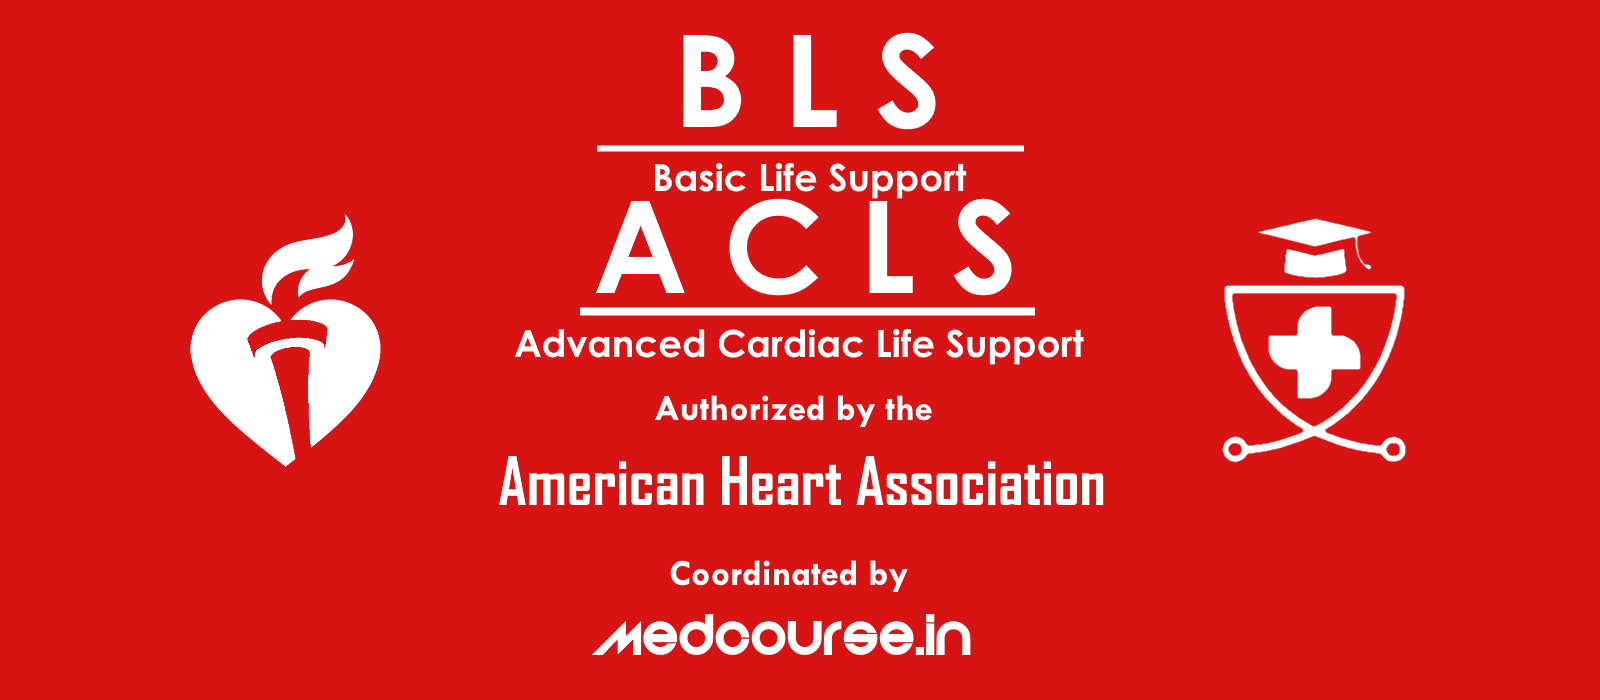 AHA BLS ACLS courses training